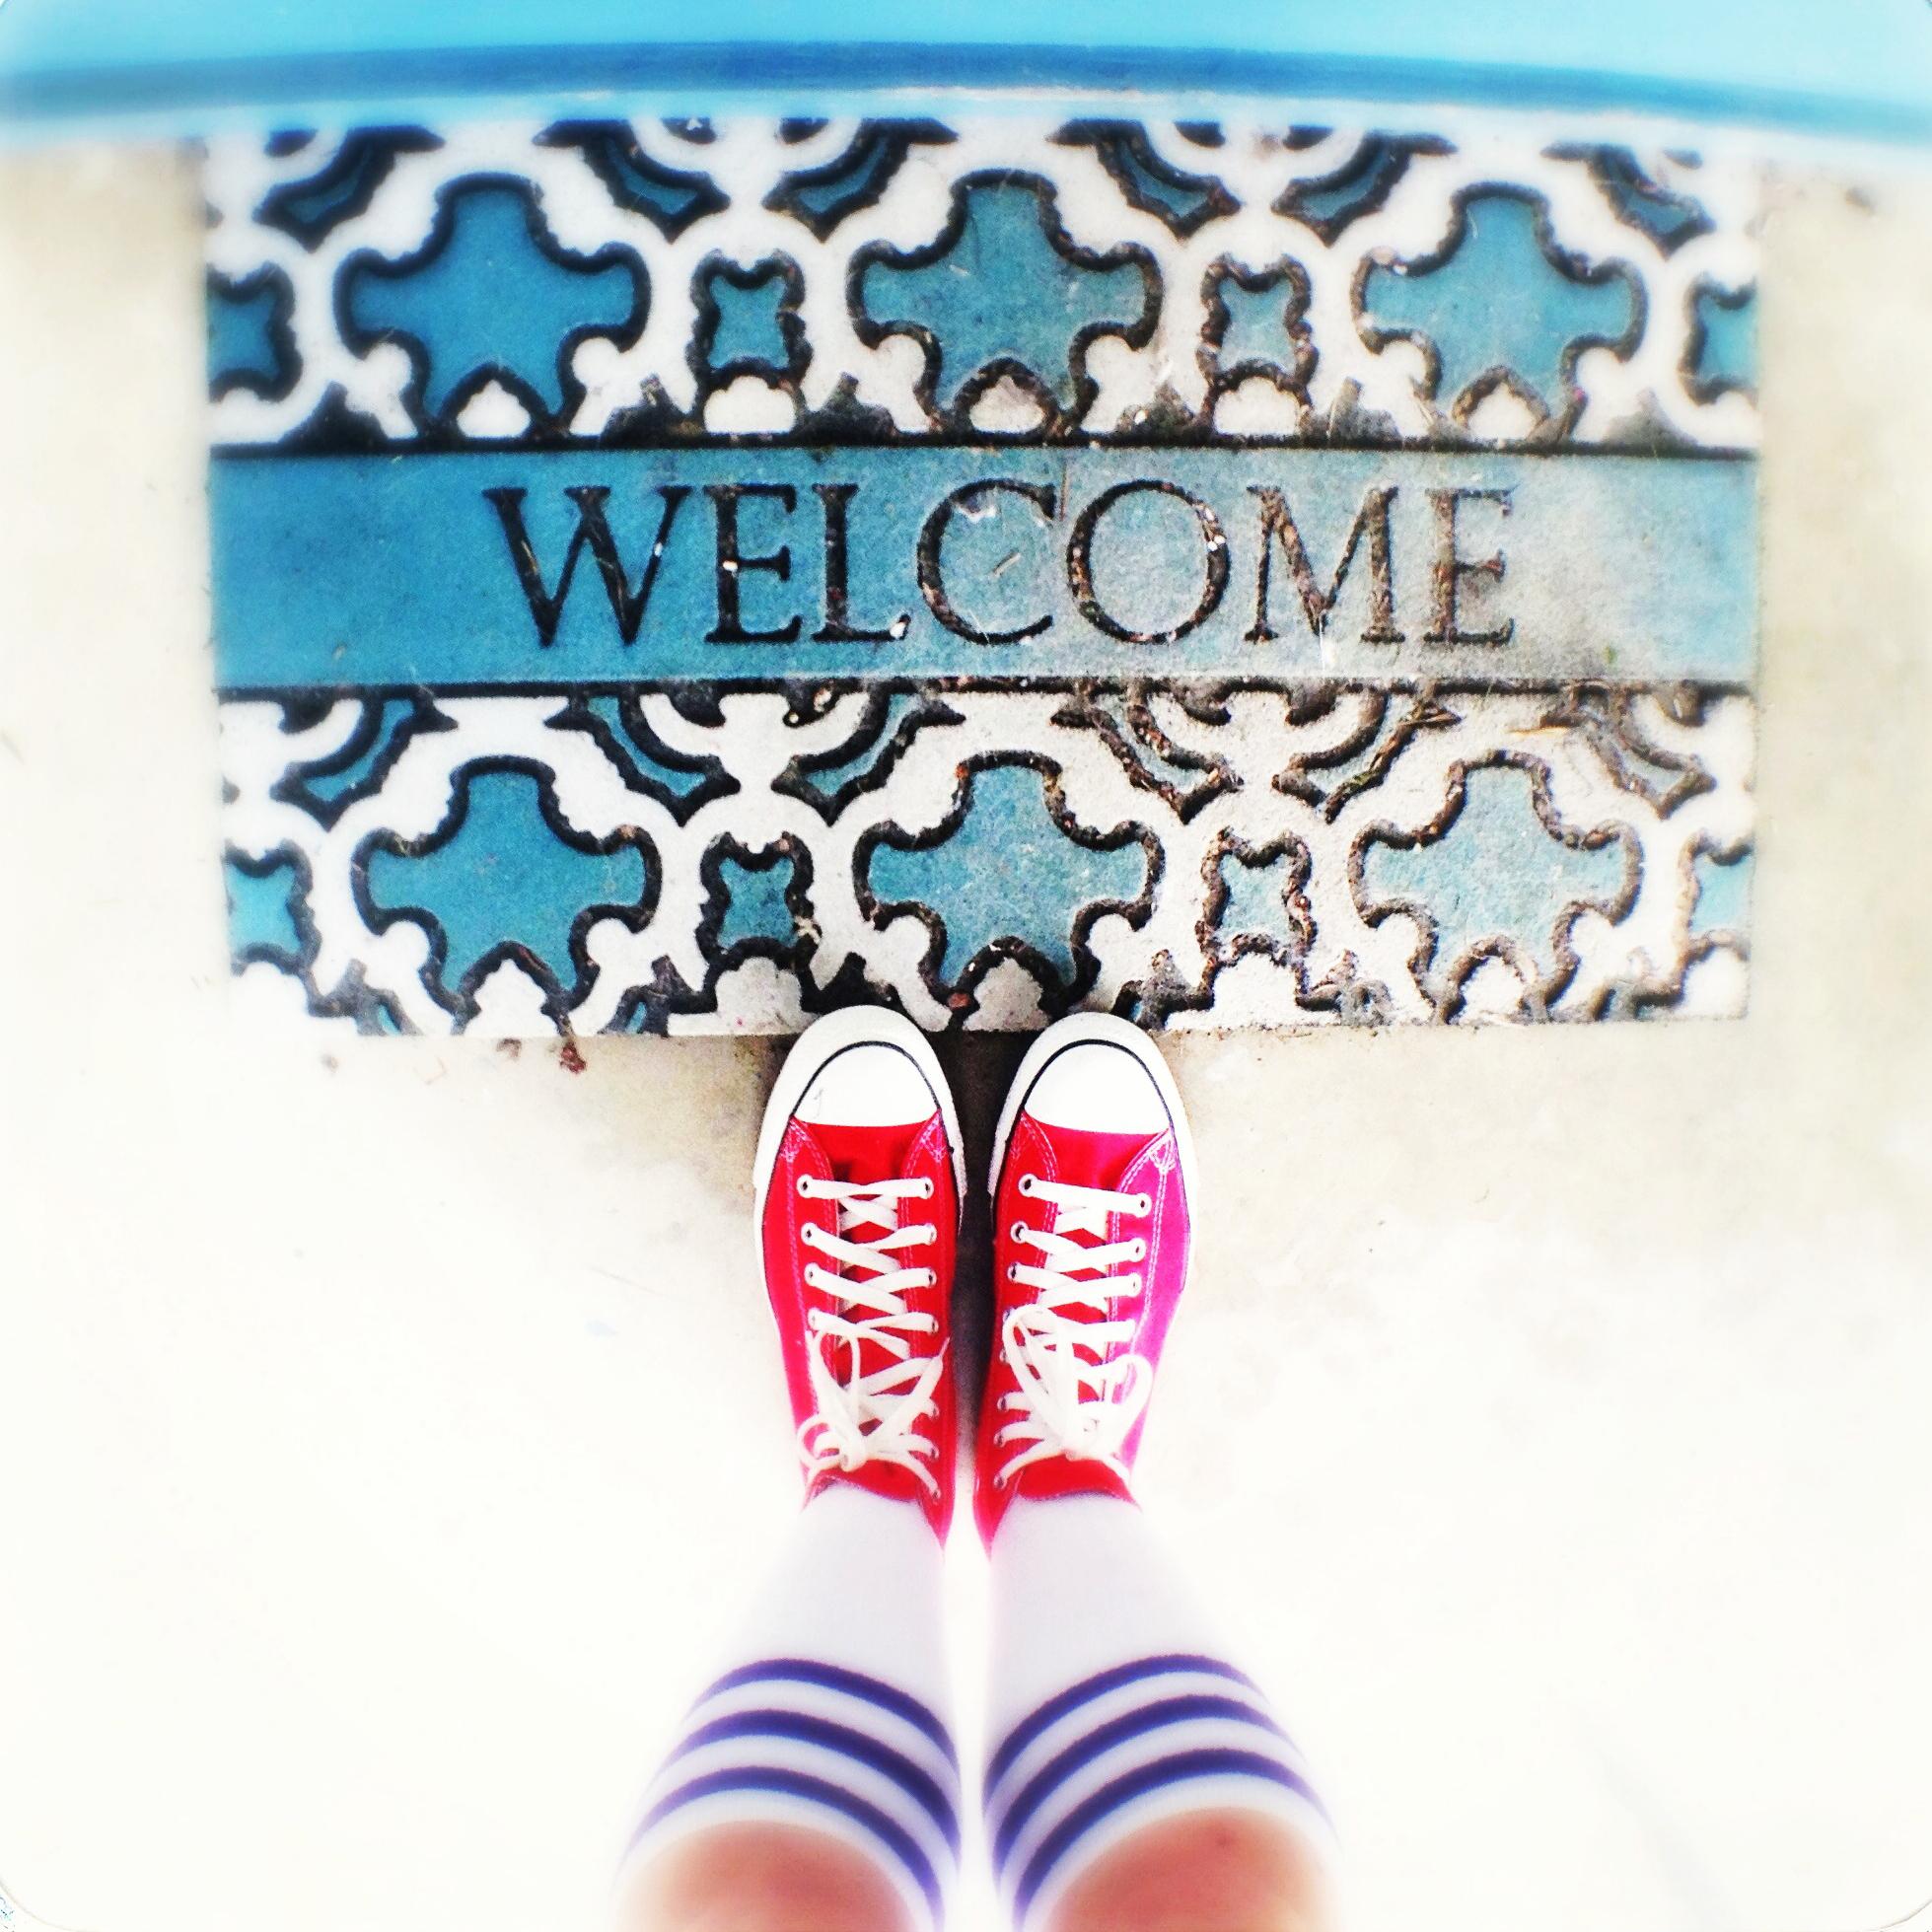 welcome_2367.jpg